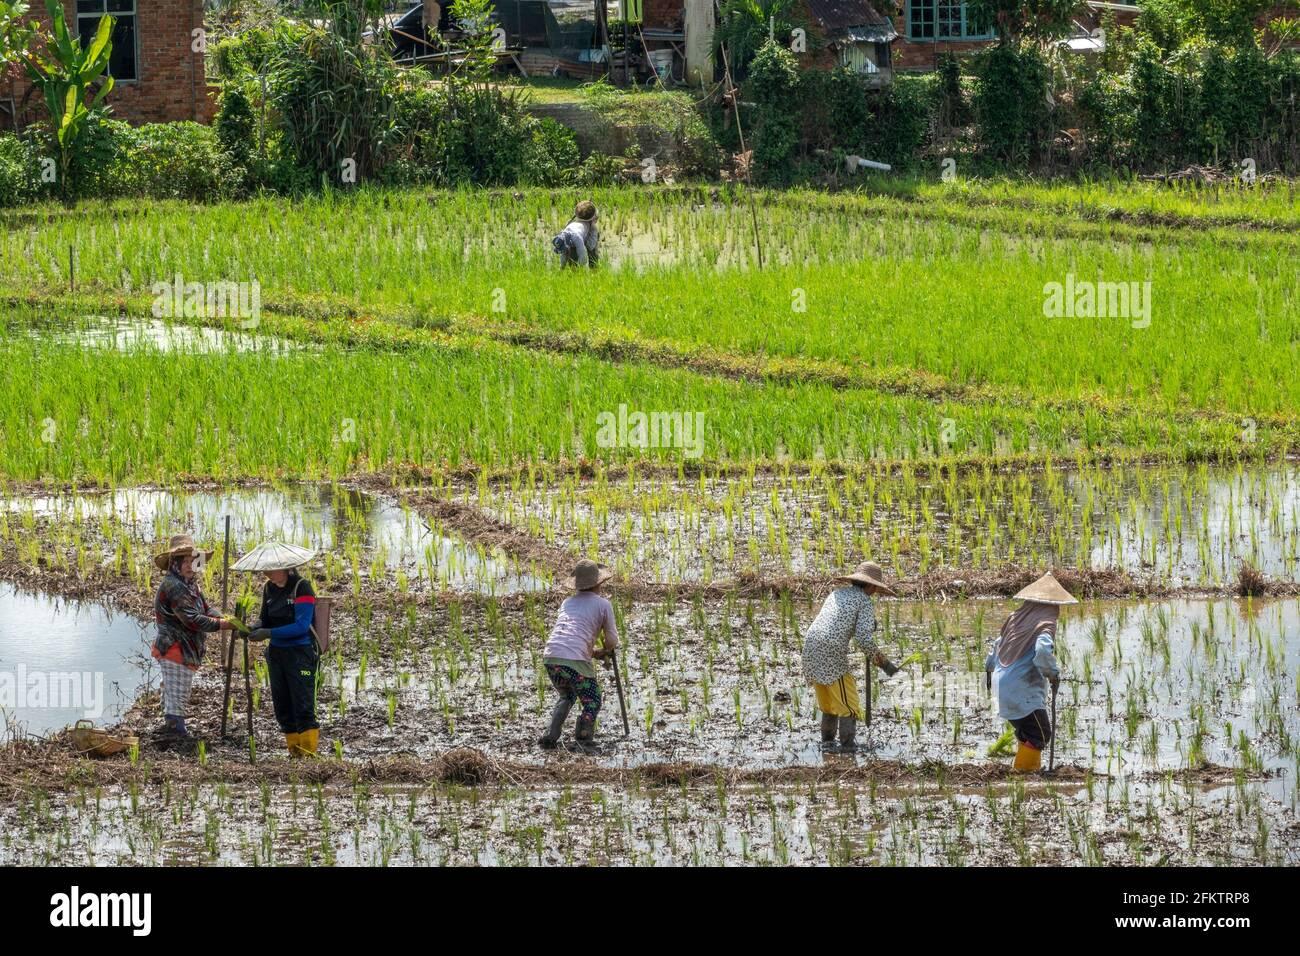 Arrozales en Tebedu, Serian, Sarawak, Malasia Oriental Foto de stock